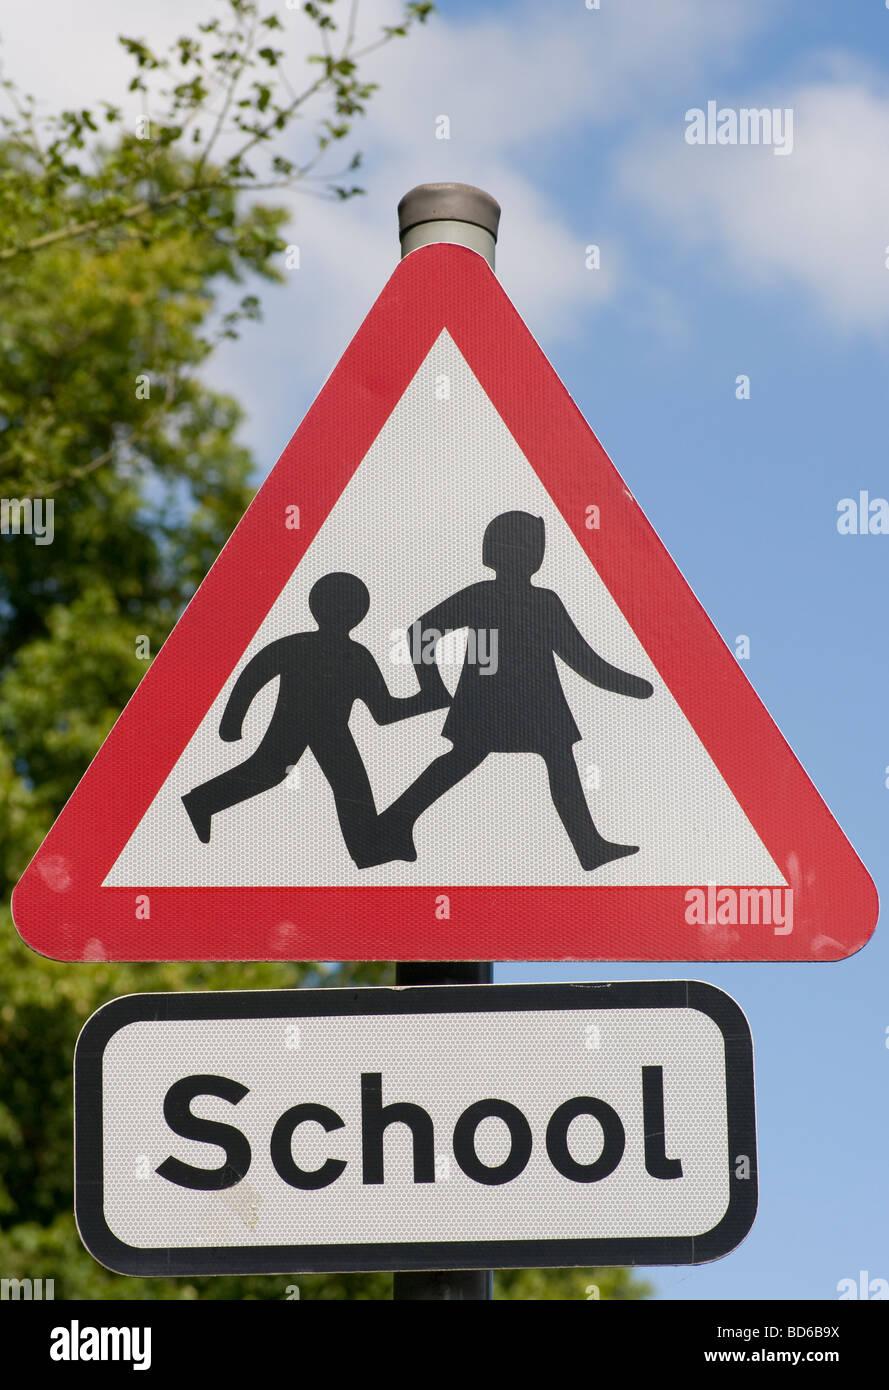 Triangular Warning School UK Road Traffic Sign Signs - Stock Image